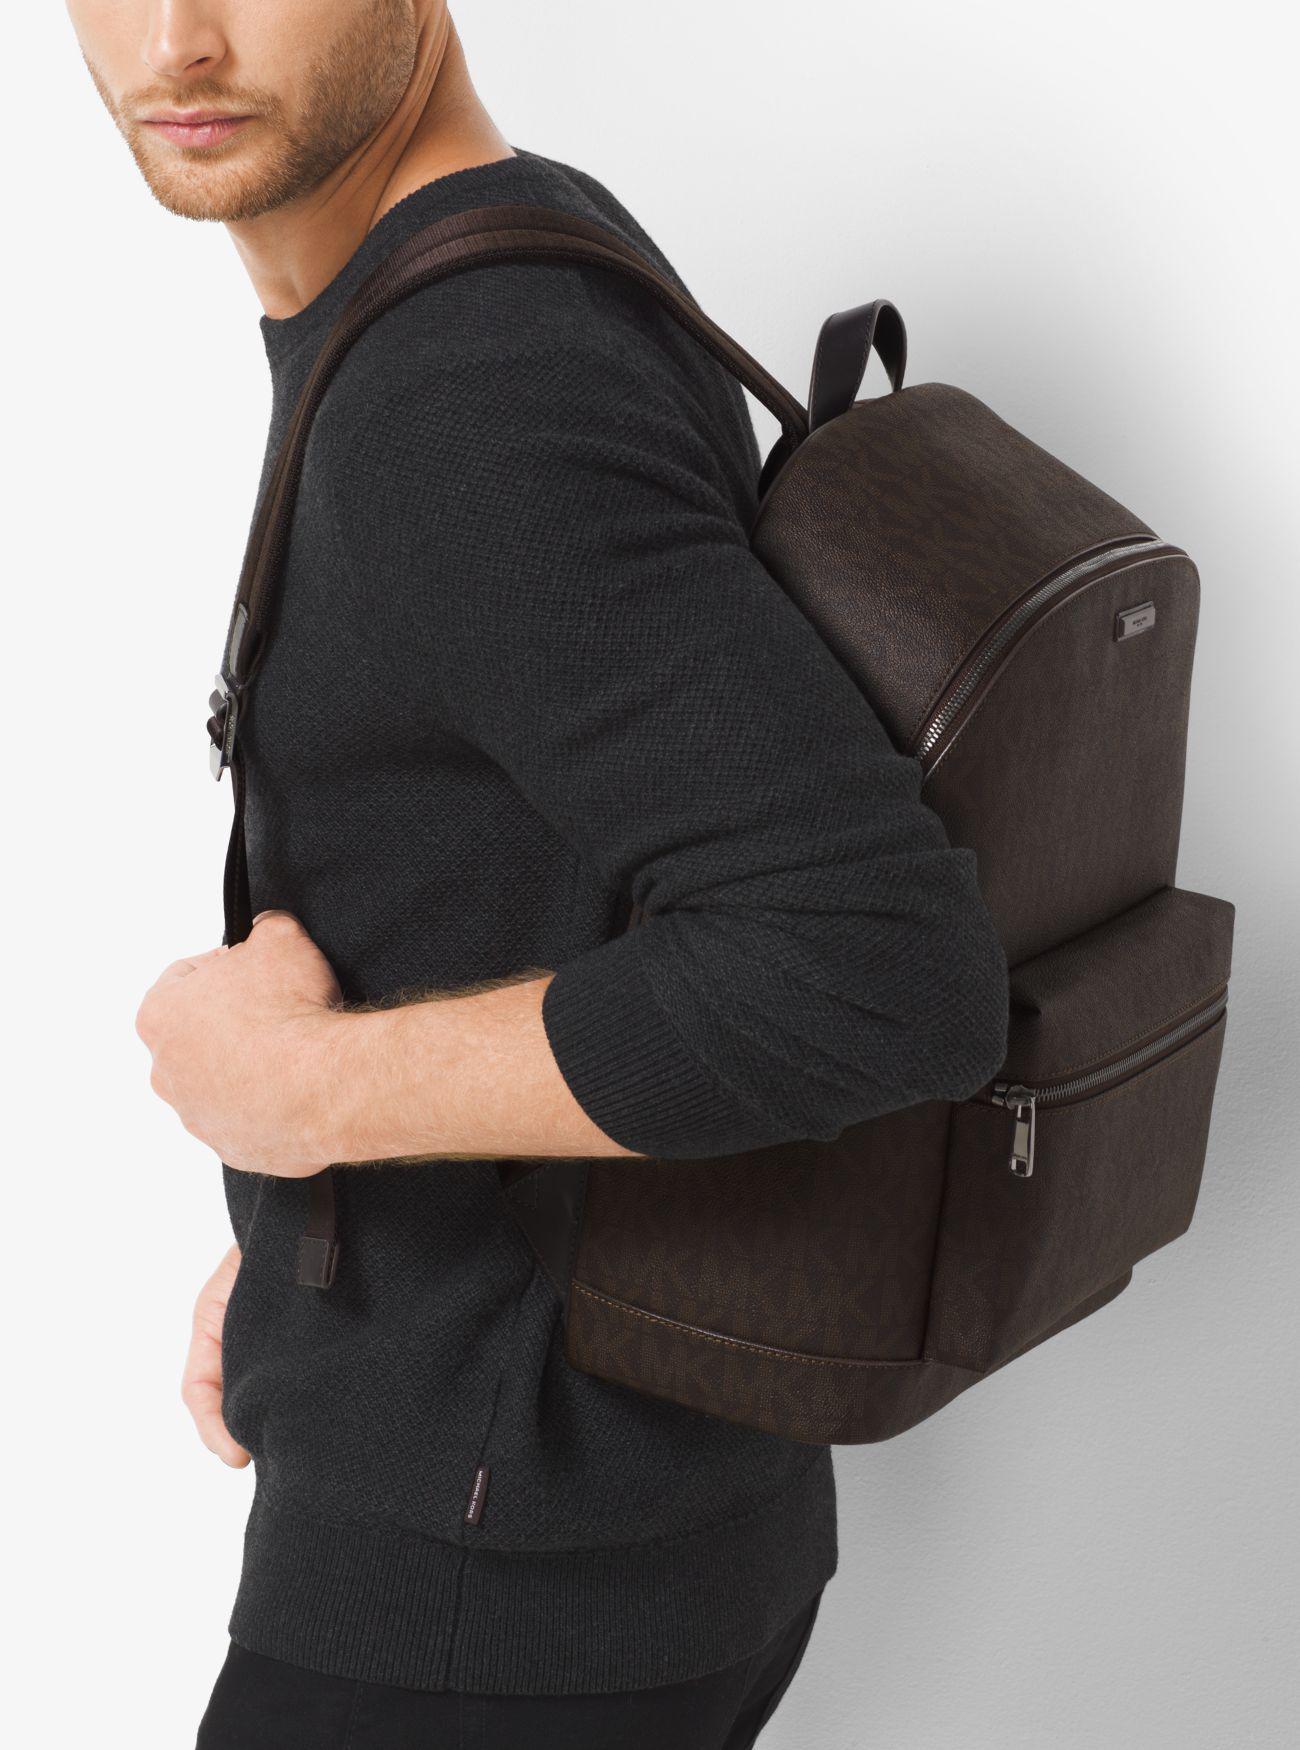 a6d4ad8703a887 Michael Kors Jet Set Logo Backpack in Brown for Men - Lyst